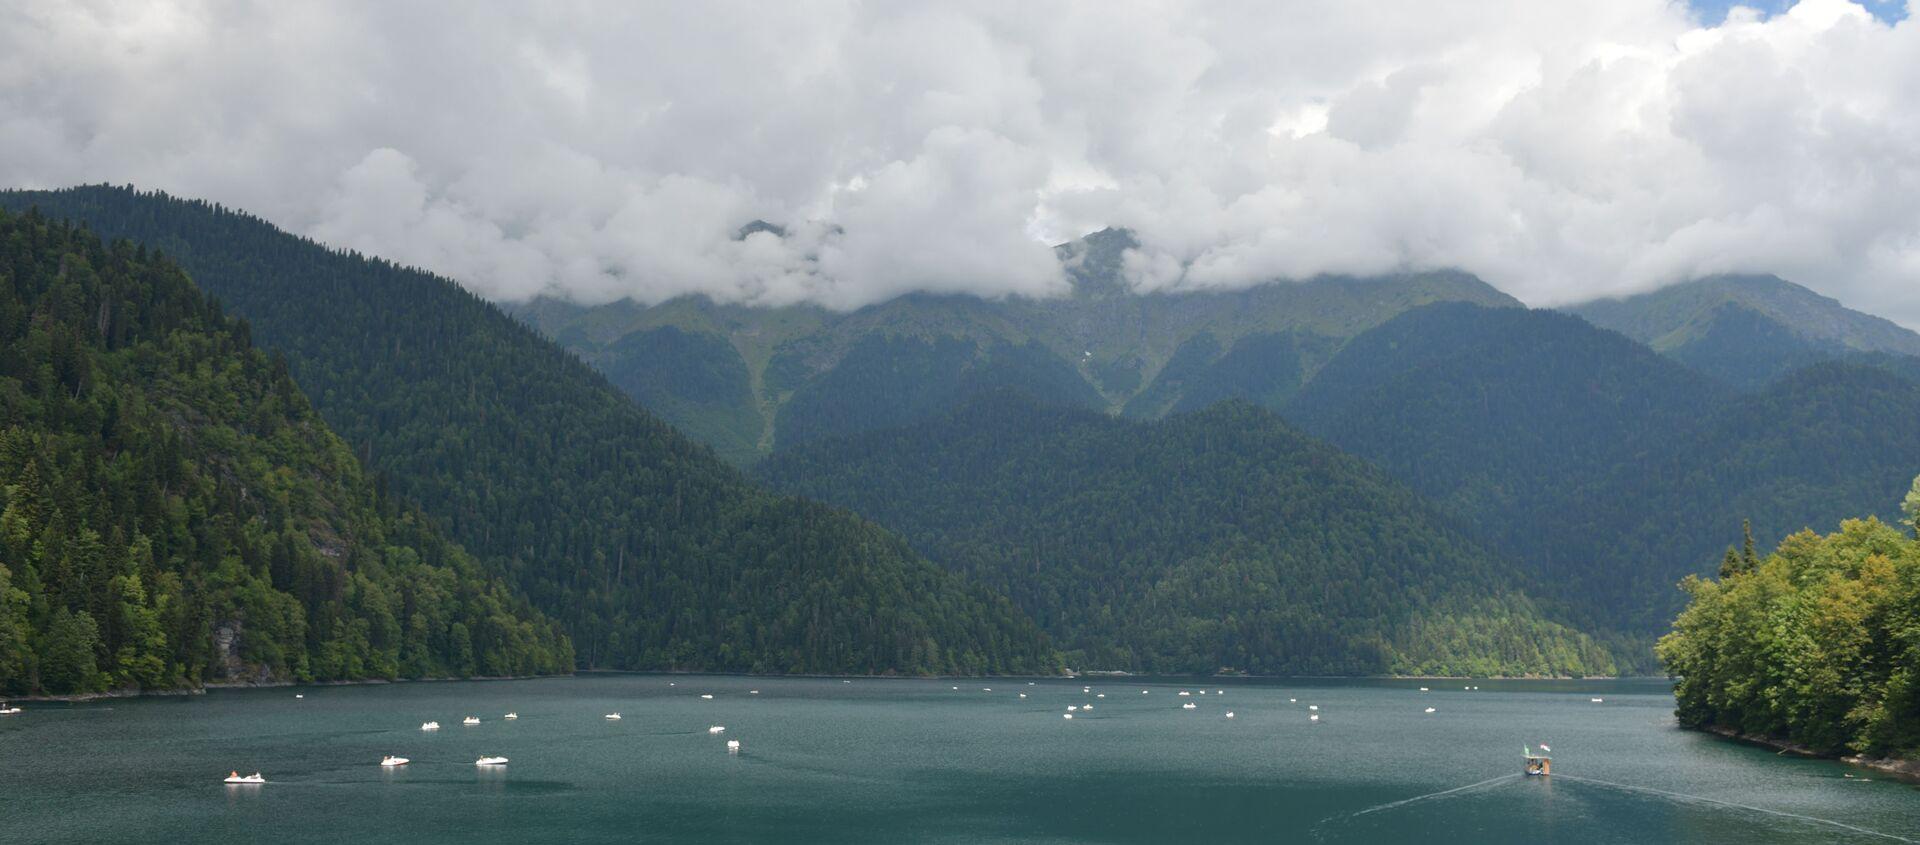 Озеро  Рица  - Sputnik Абхазия, 1920, 23.07.2021